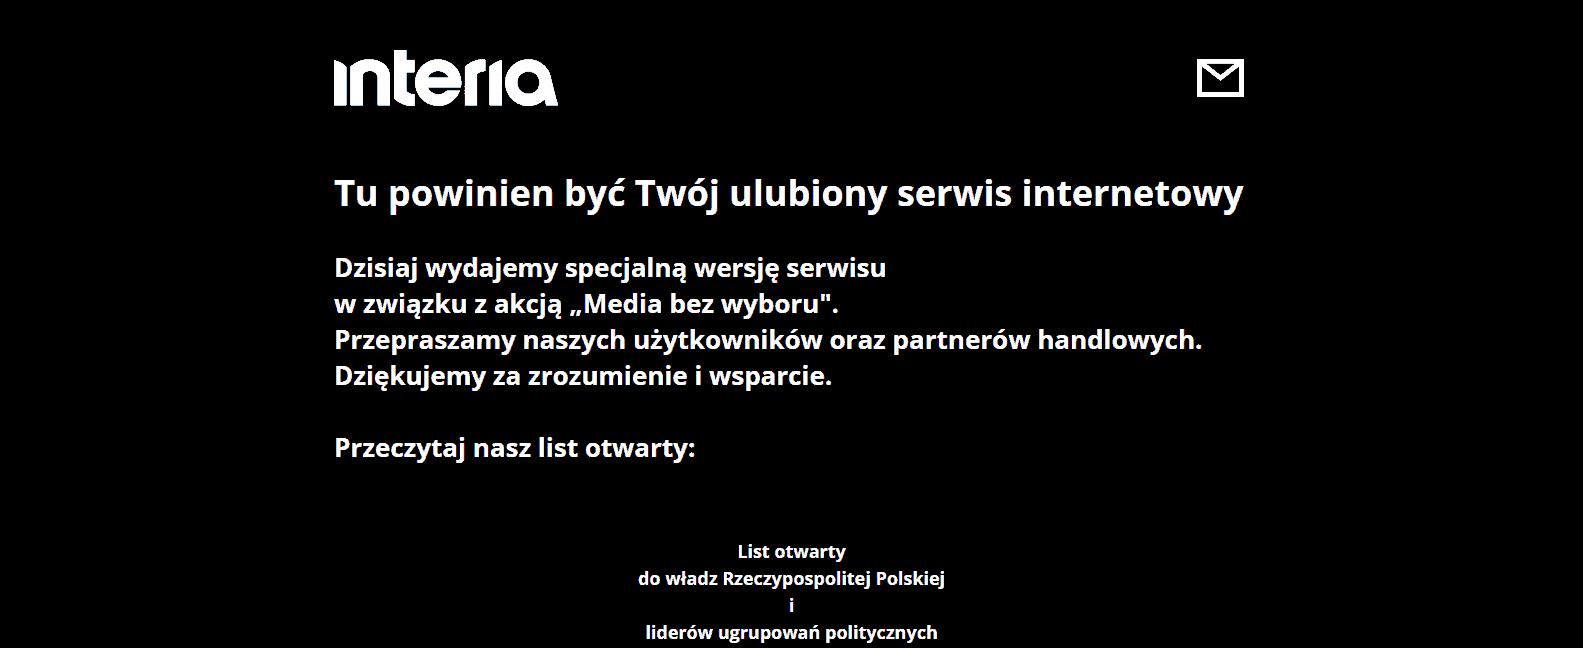 Zrzut ekranu interia.pl - protest mediów